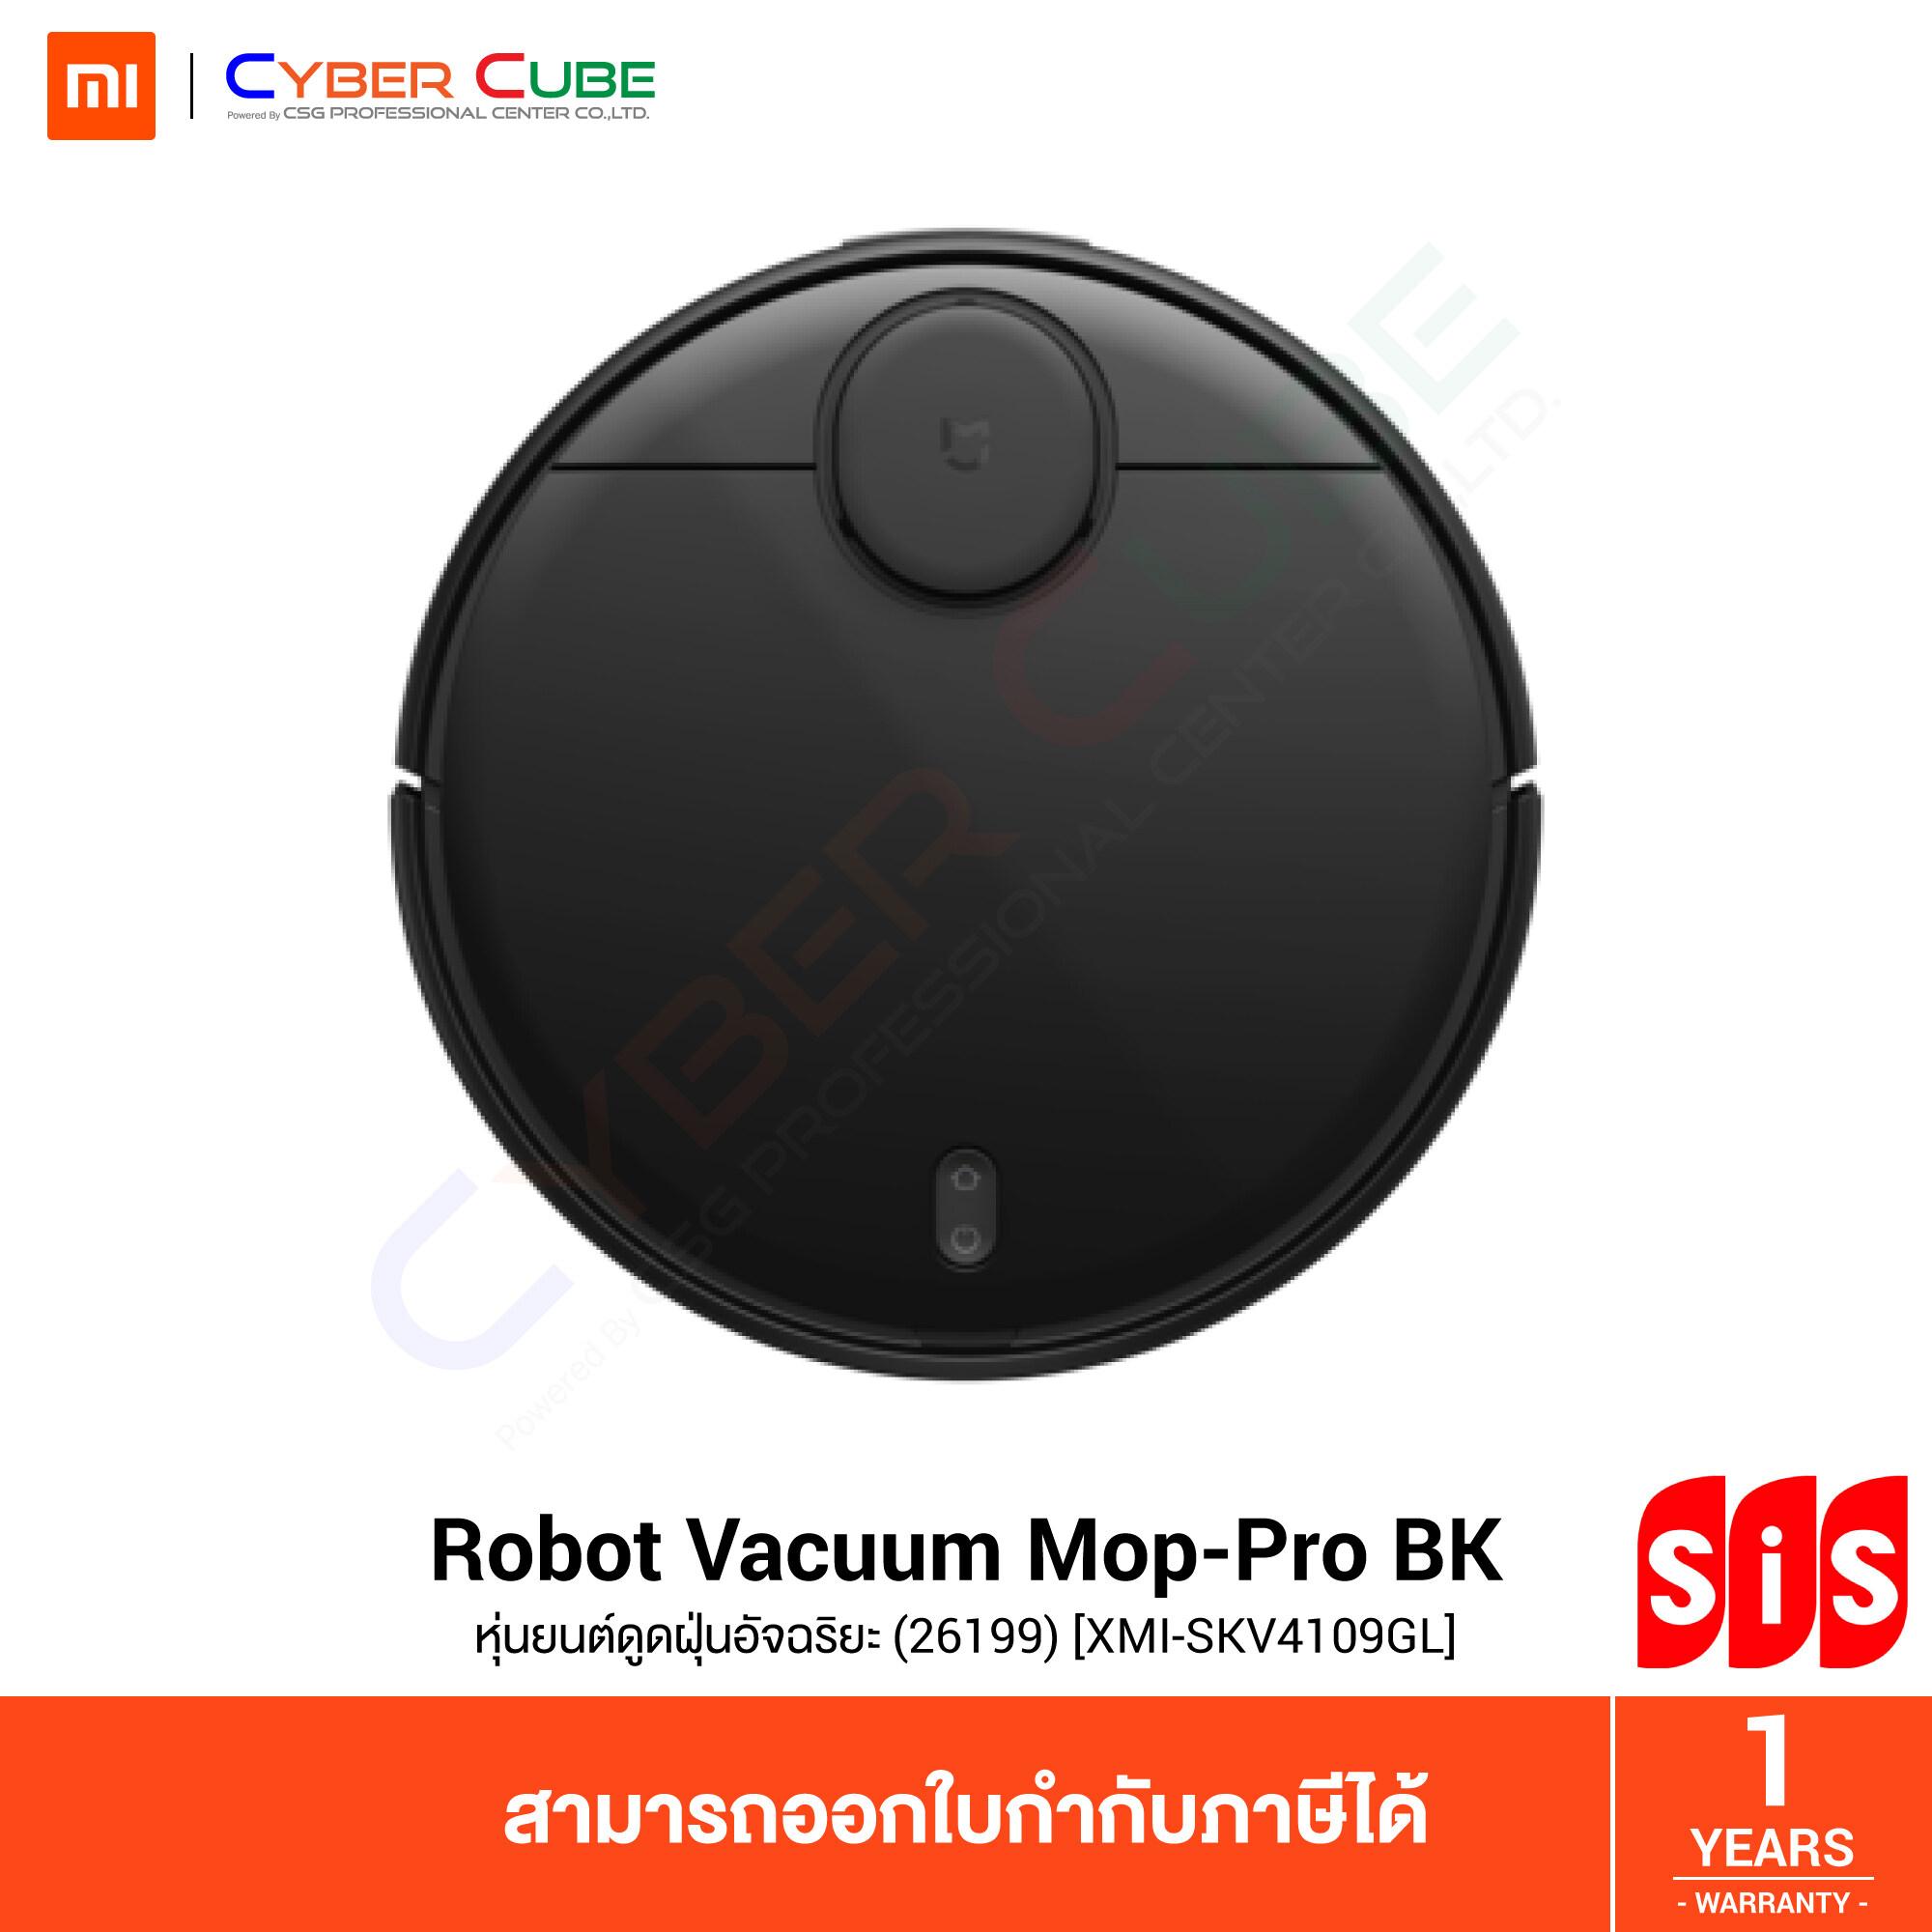 Xiaomi Mi Robot Vacuum Mop-Pro BK (26199) [XMI-SKV4109GL] – (หุ่นยนต์ดูดฝุ่นอัจฉริยะ) VACUUM CLEANER